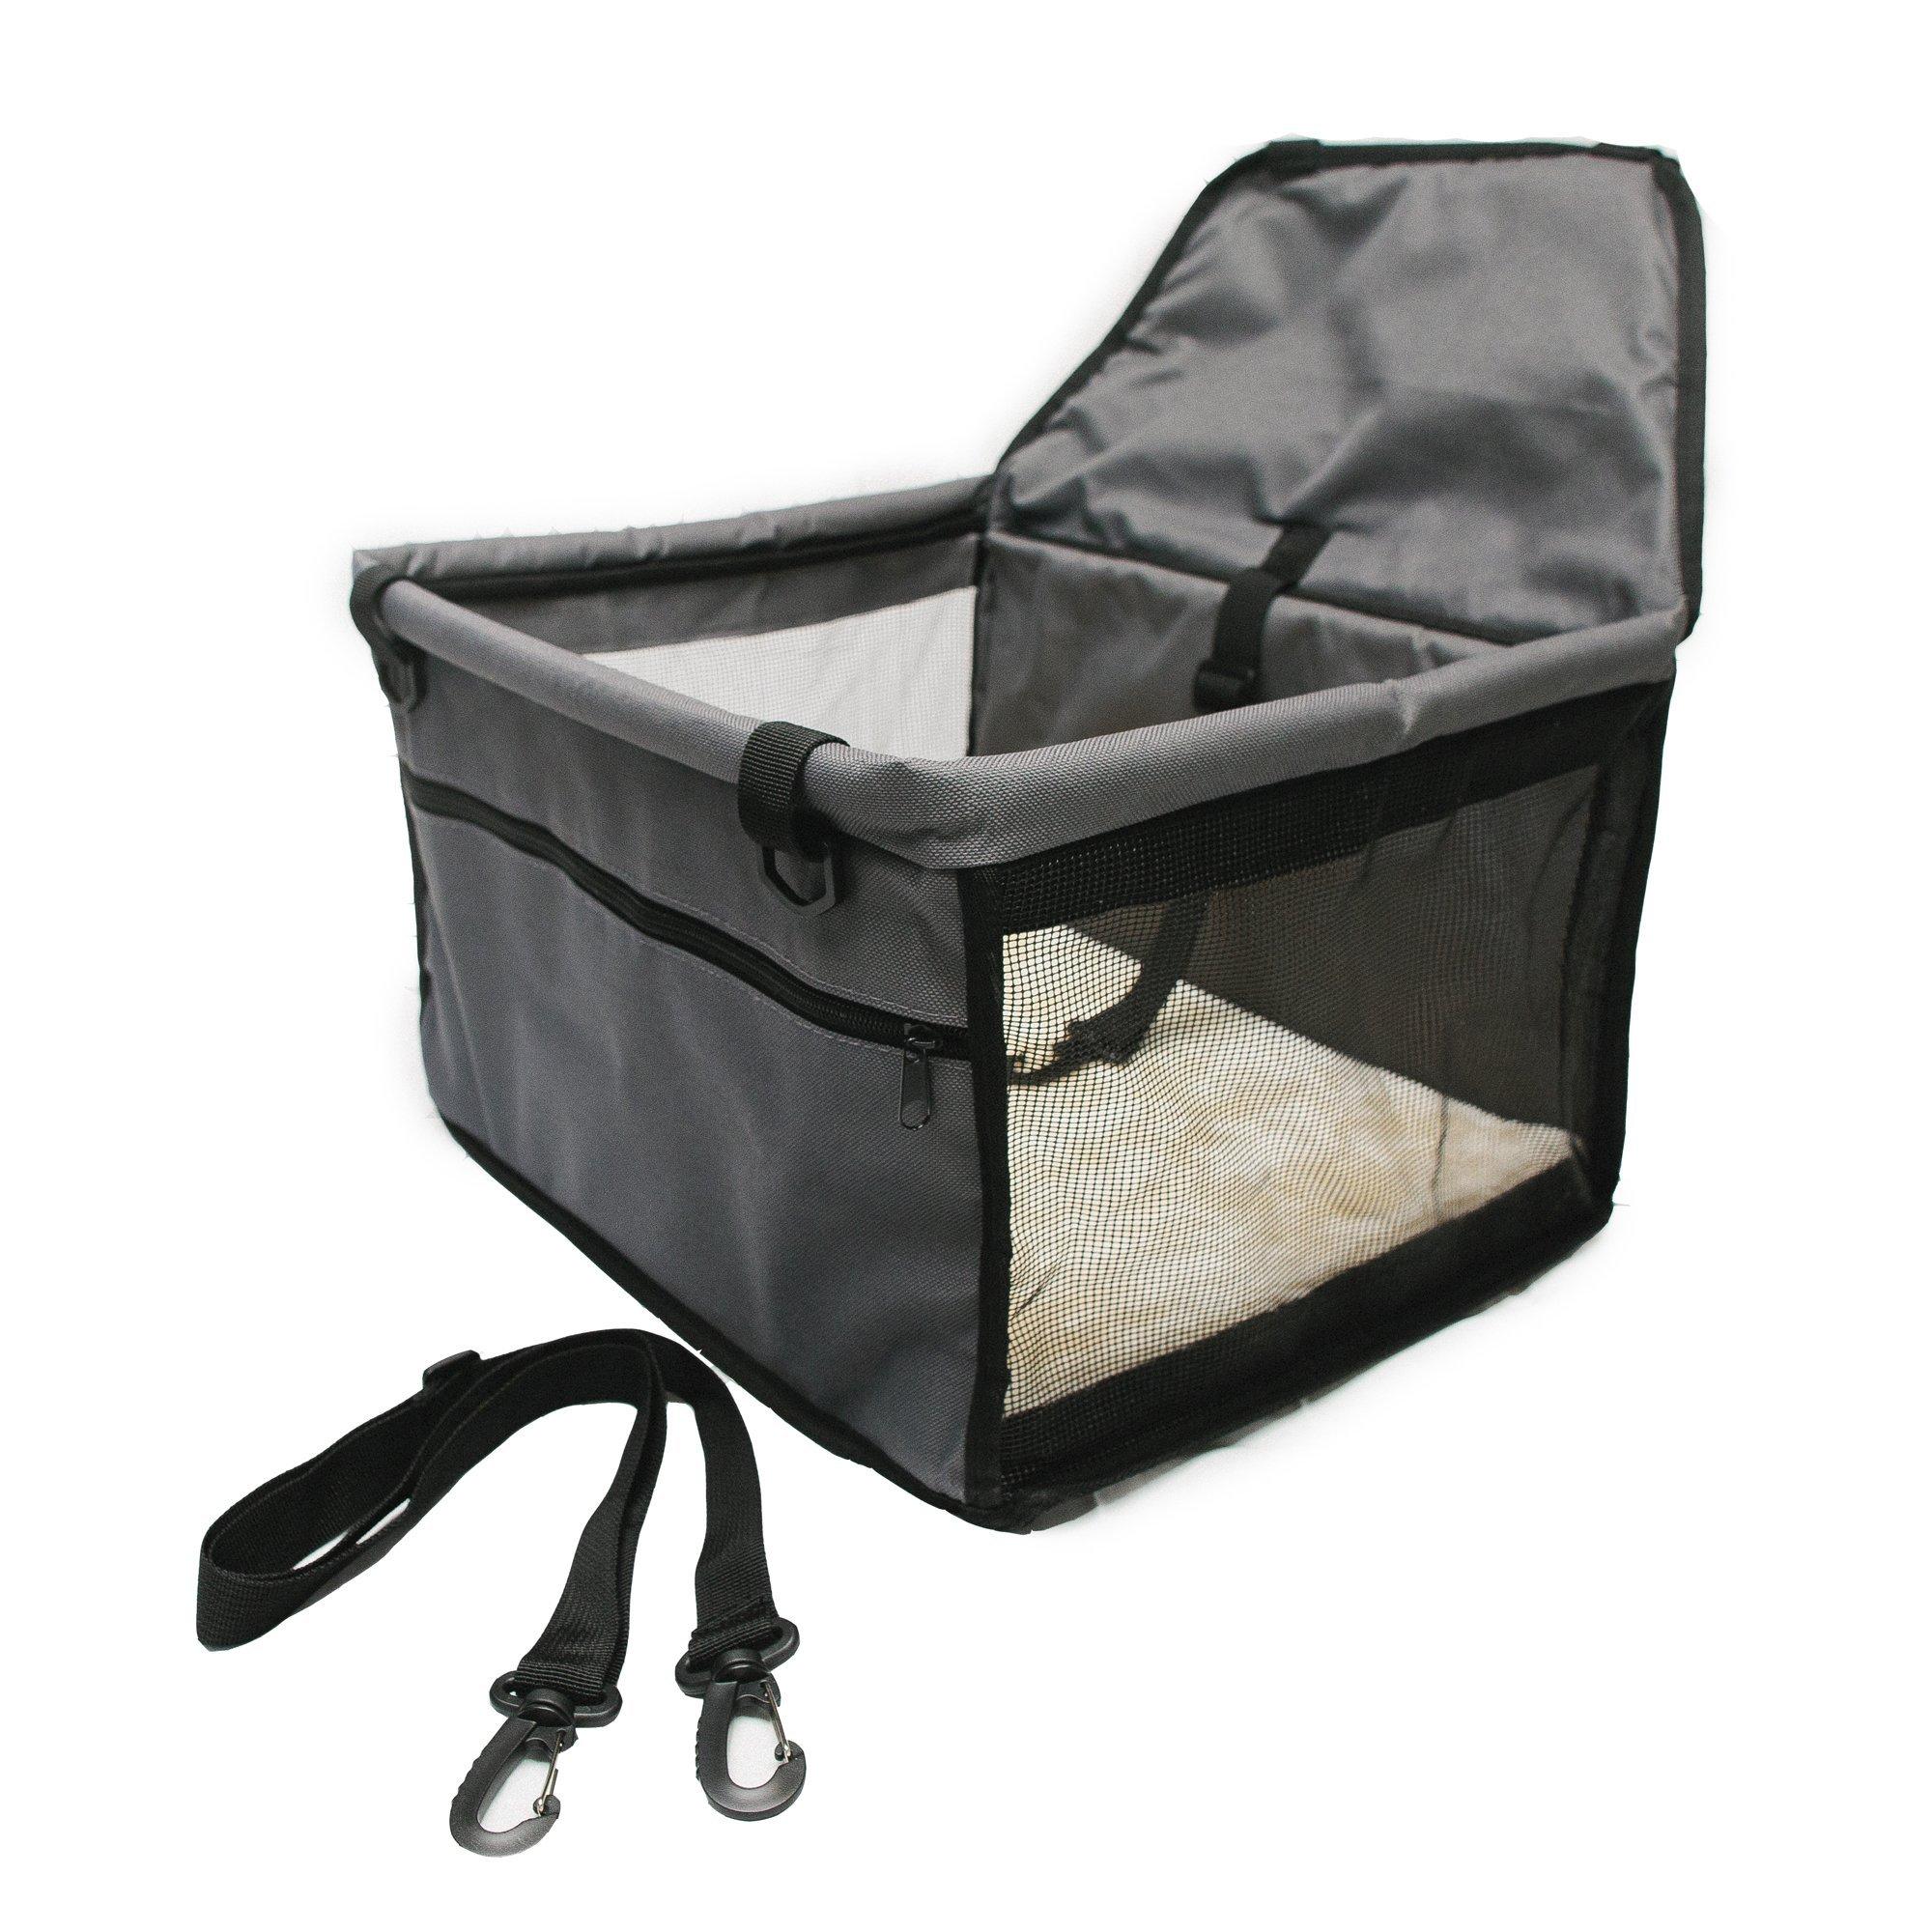 Pet Fun Factory Dog Car Seat Dog Booster Seat, Sturdy Construction Plush Padding, Dark Grey